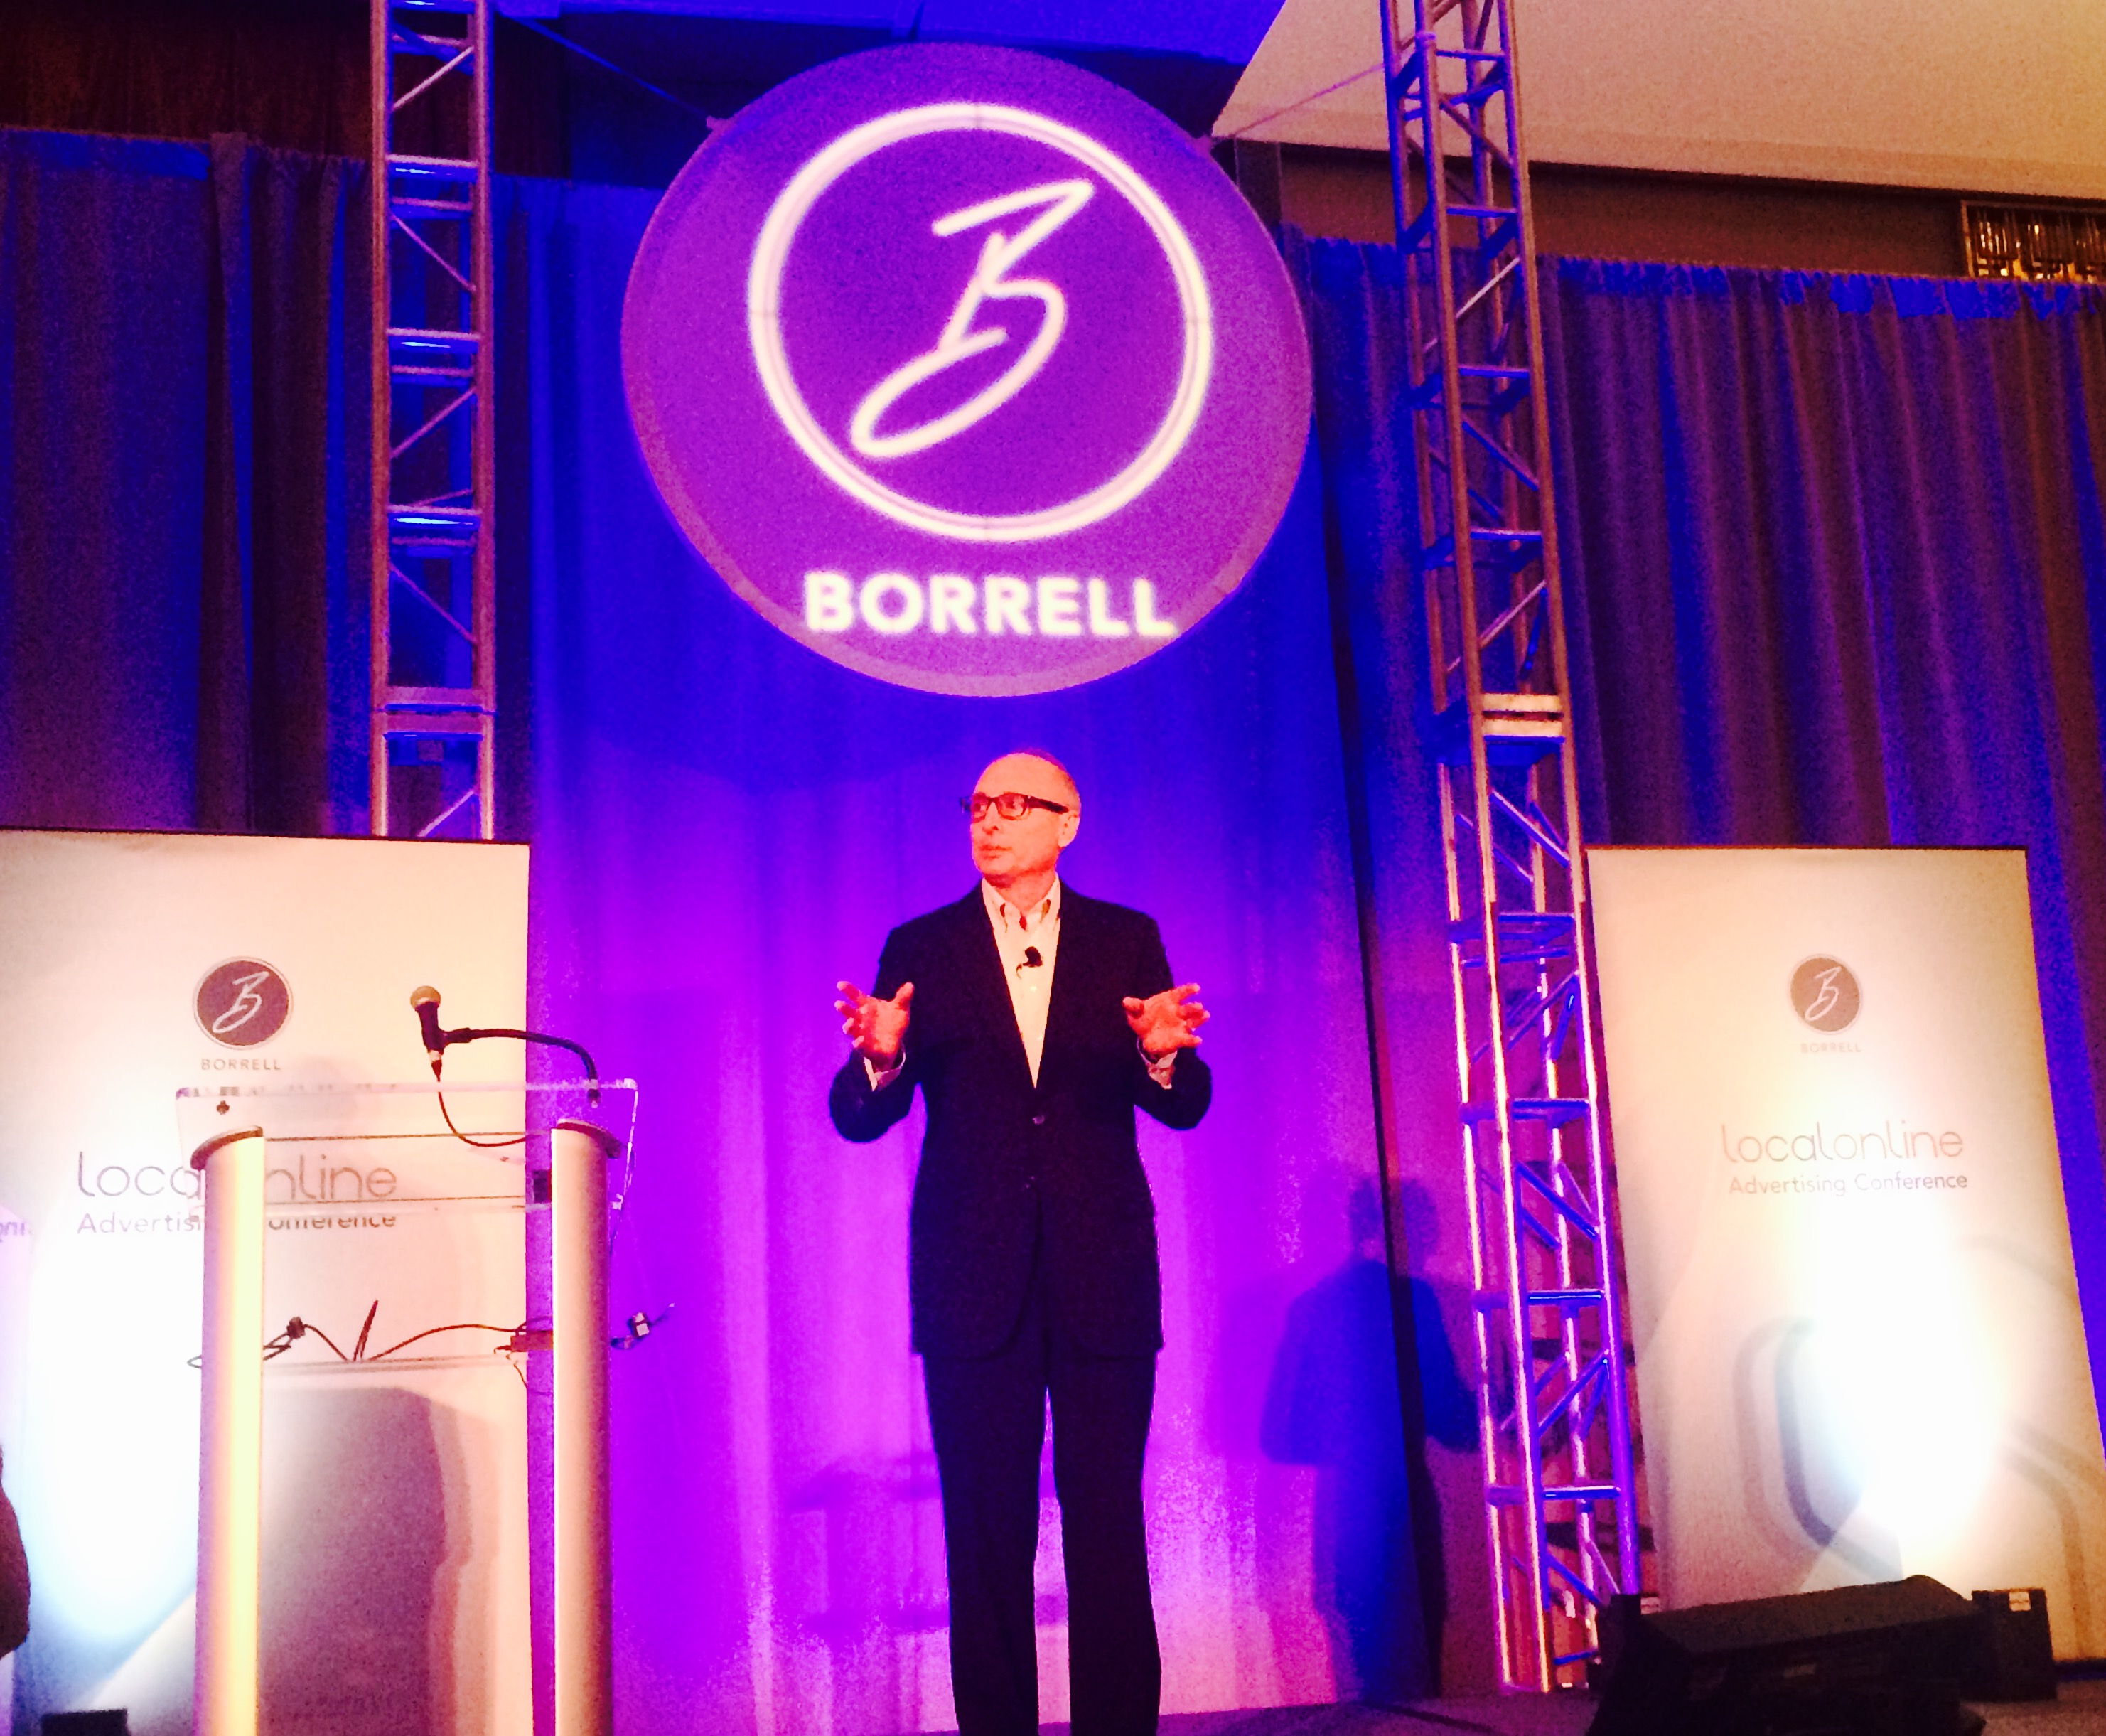 Gordon Borrell